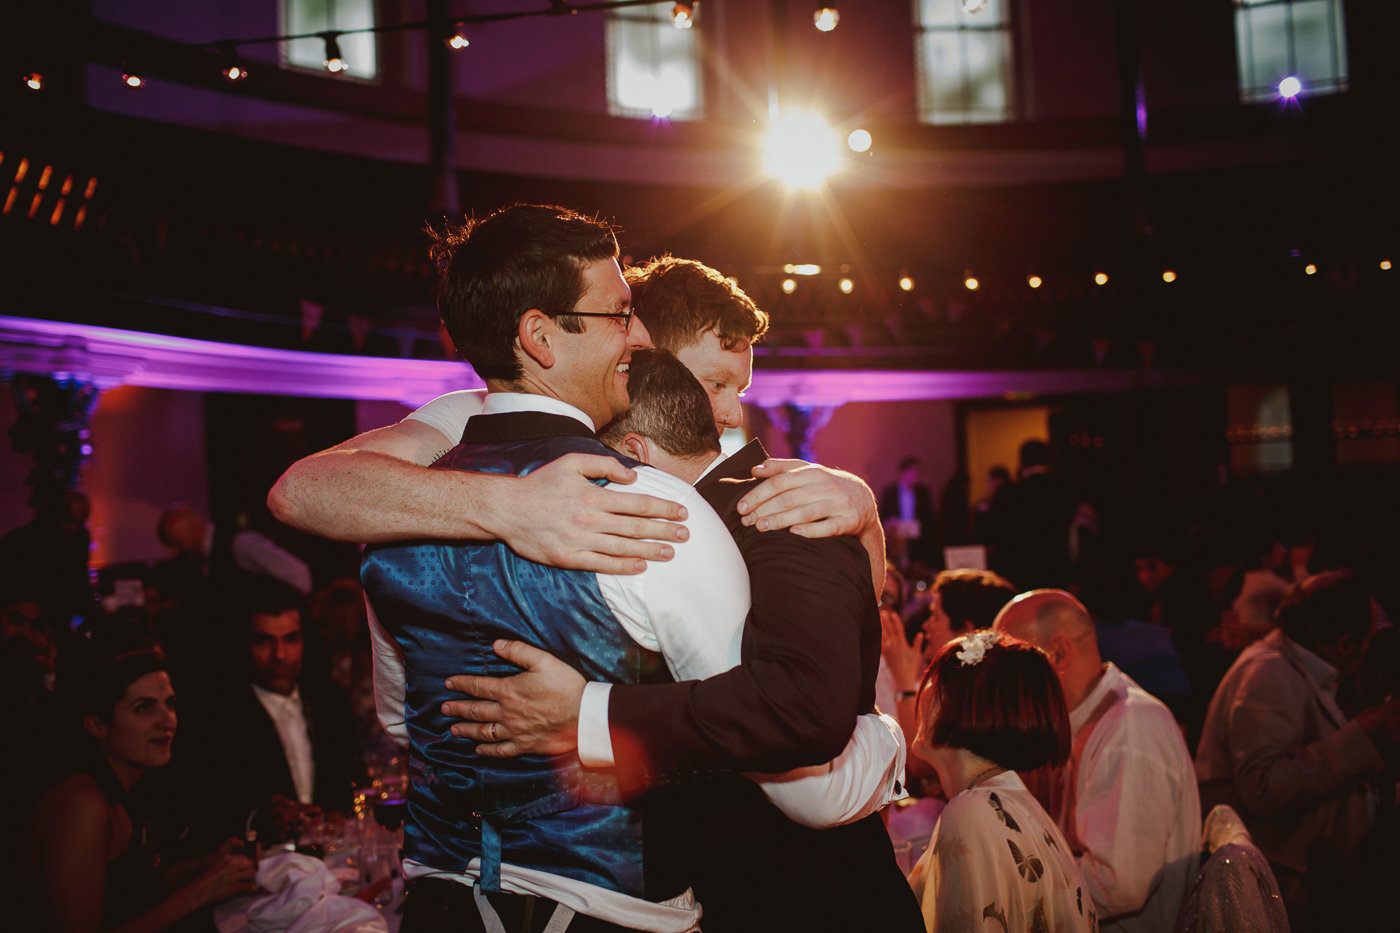 jewish-wedding-photographer-london-52.jpg